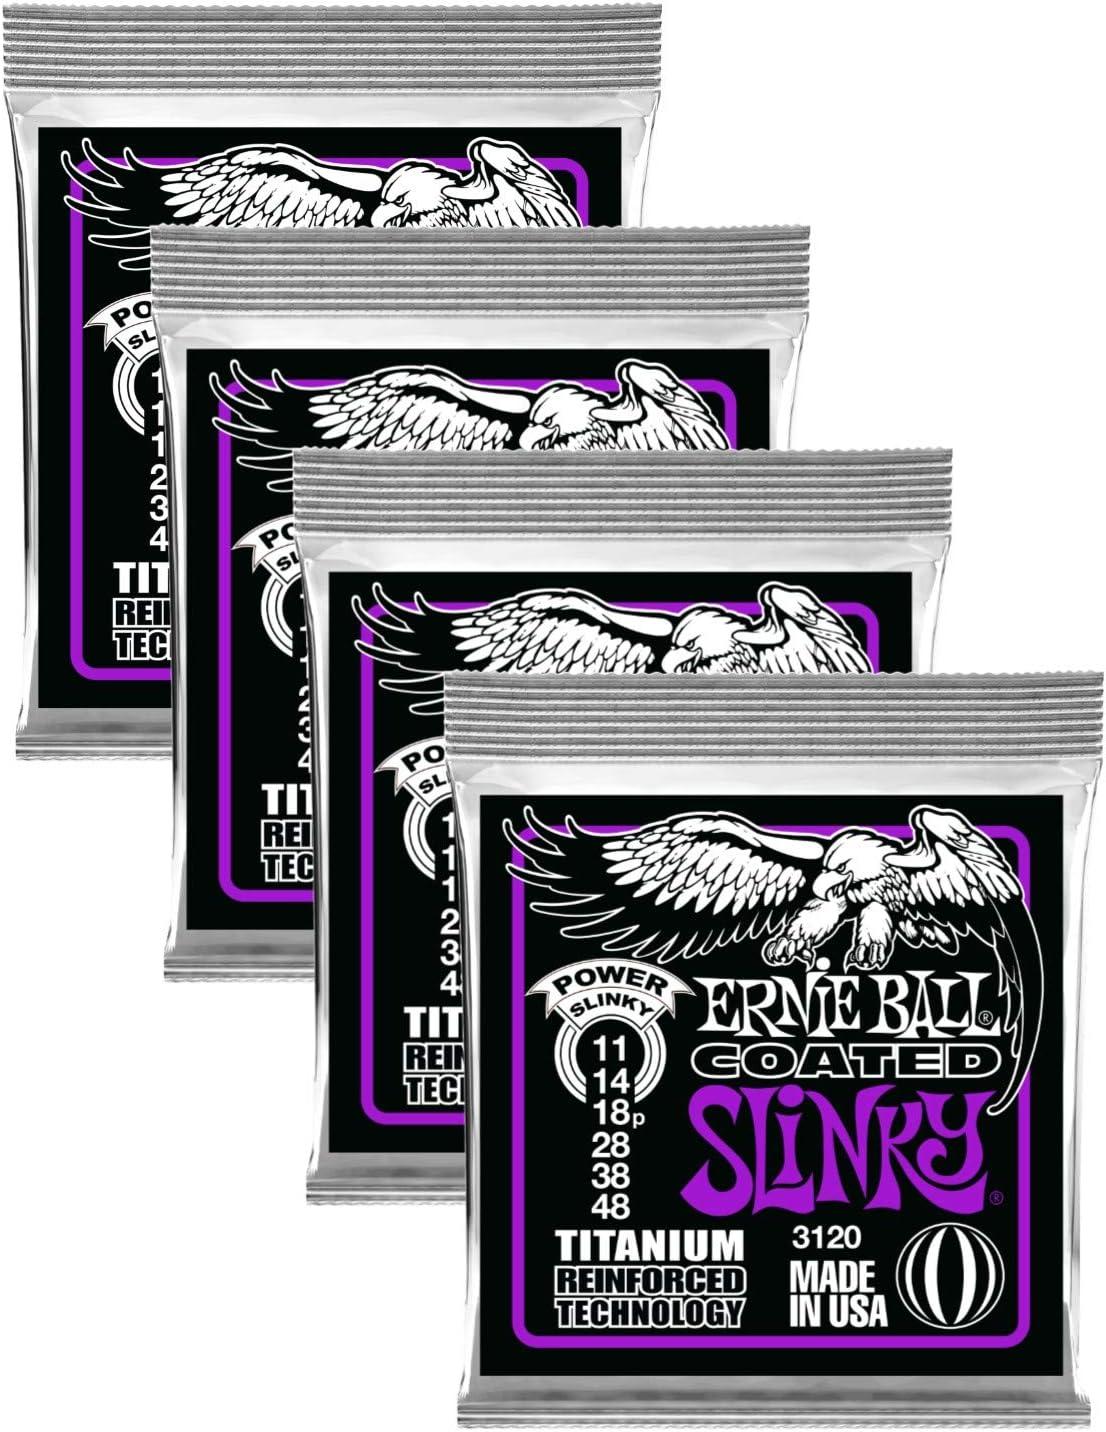 Ernie Ball Trust 3120 Coated Titanium Slinky Electric Str Guitar In a popularity Power